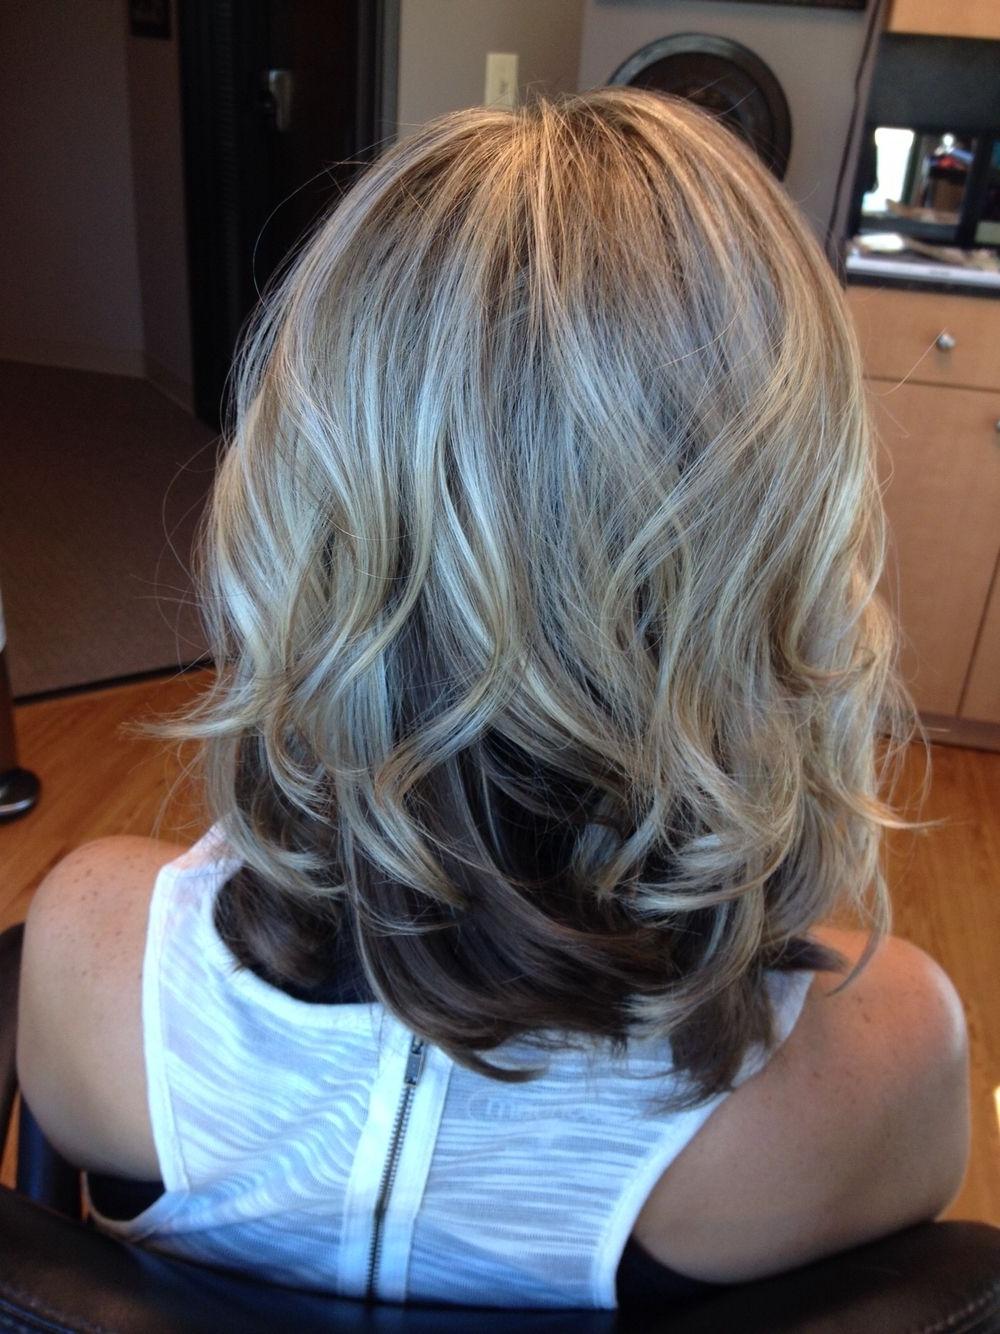 Blonde Top, Dark Underneath (View 9 of 20)